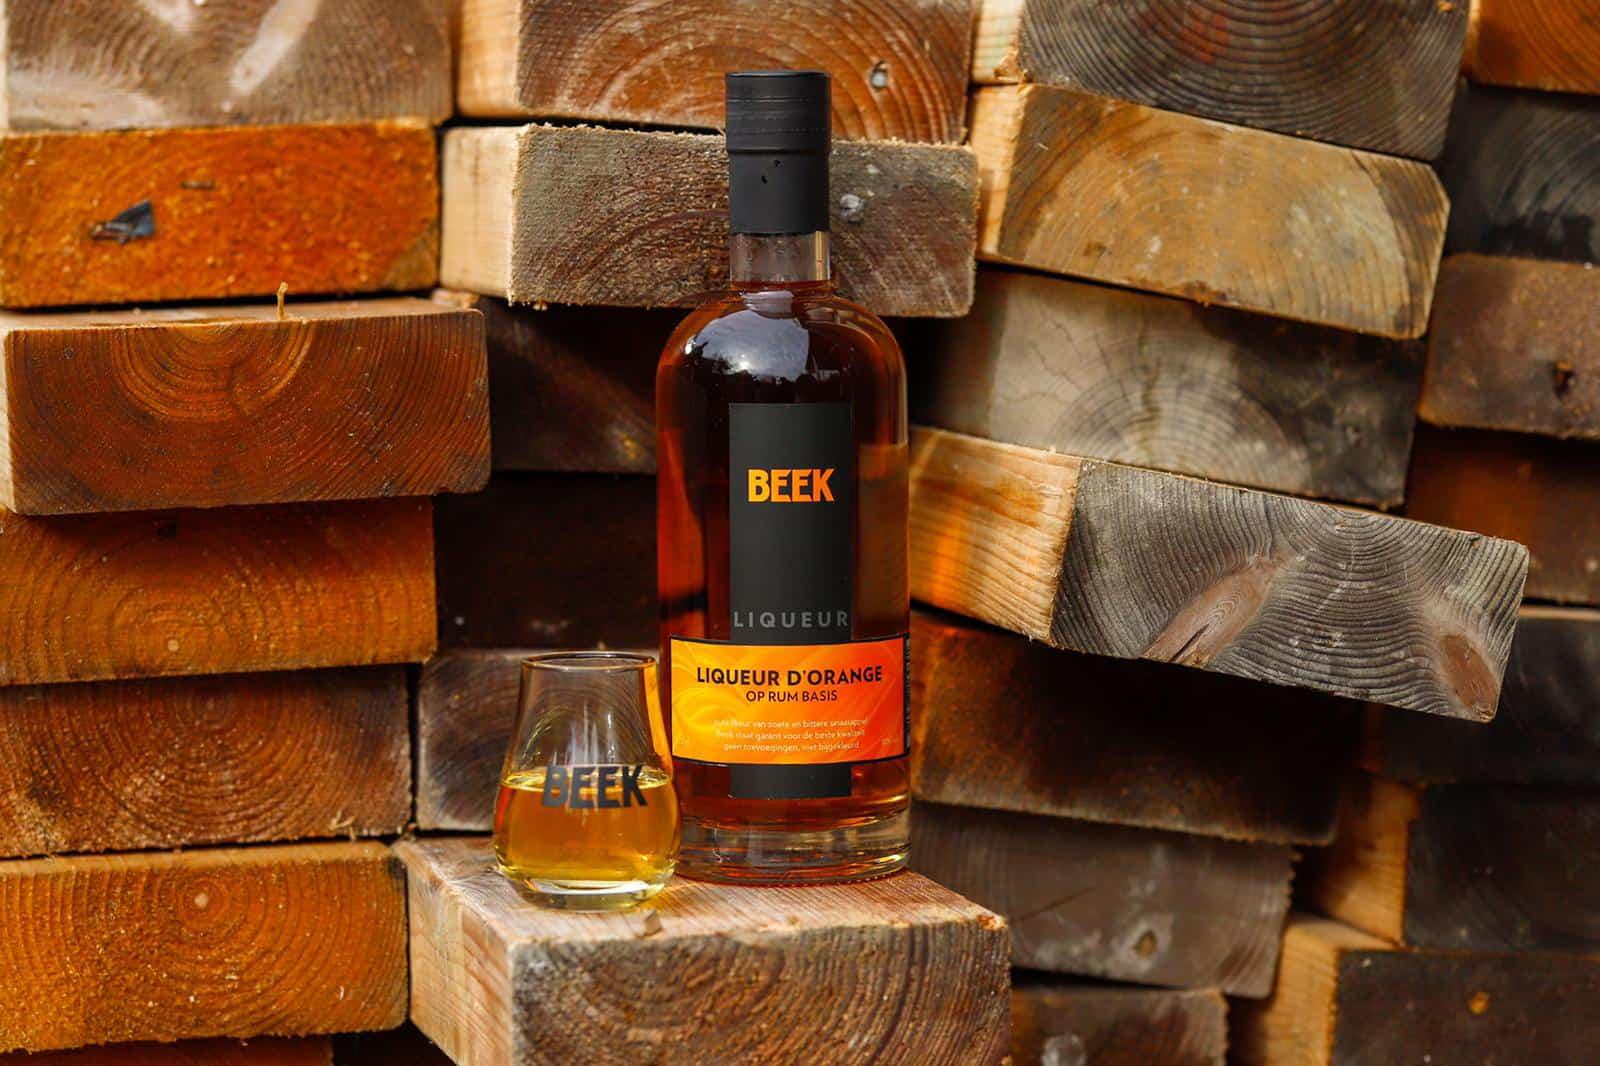 Beek Liqueur d'Orange Jesse Reij